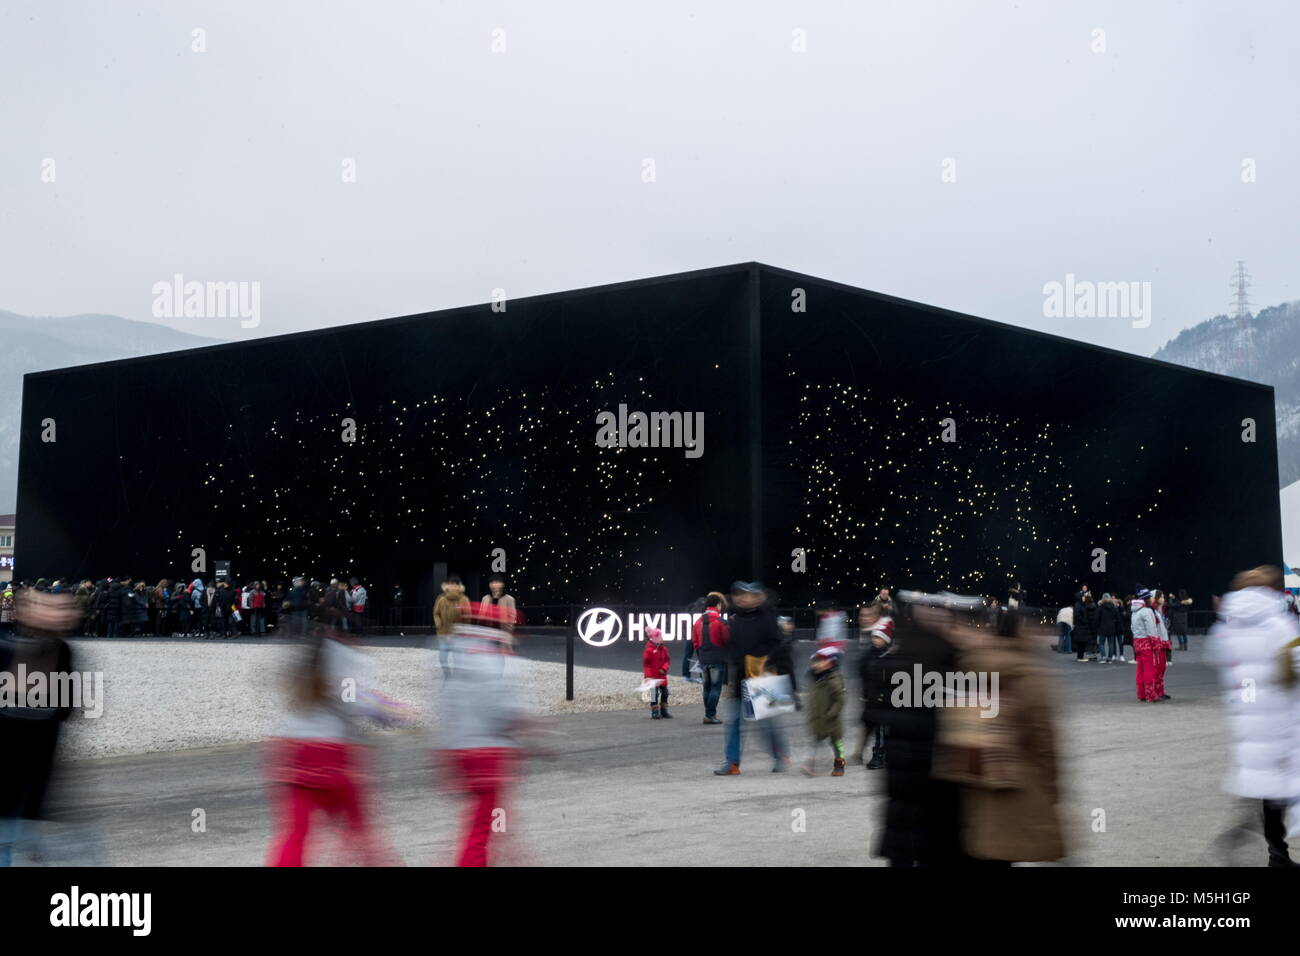 PYEONGCHANG, SOUTH KOREA - FEBRUARY 23, 2018: A pavilion, nicknamed the super-black building, designed by British - Stock Image